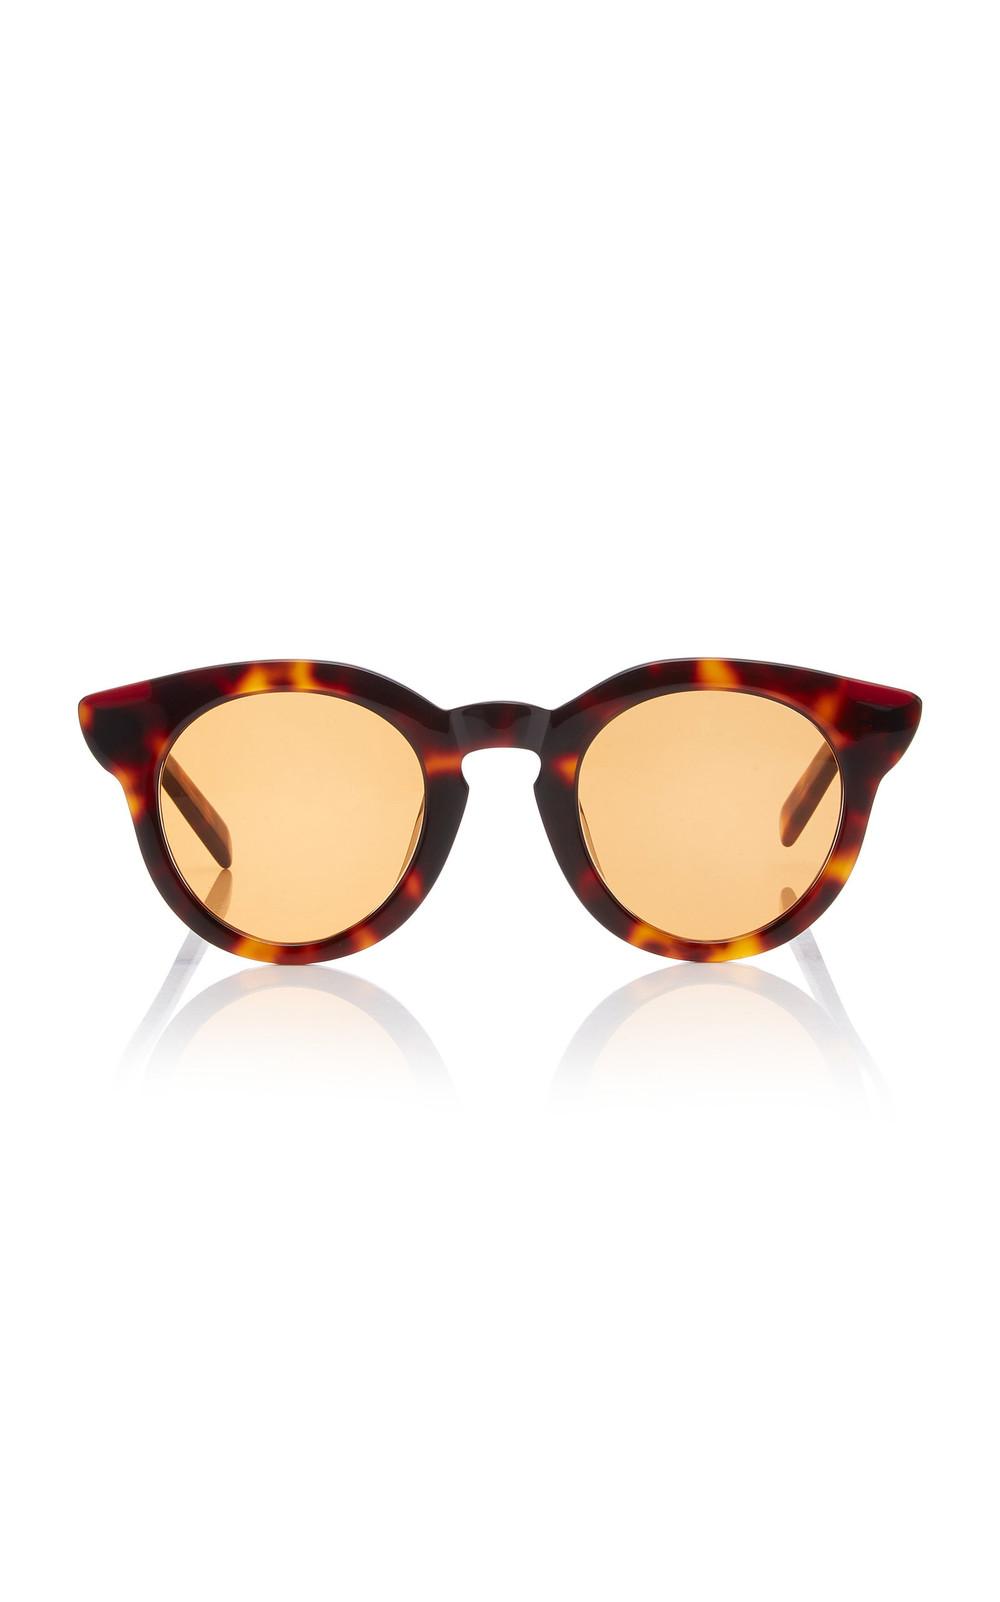 940b0fc1e2214 Spektre Fingers Round-Frame Acetate Sunglasses in orange